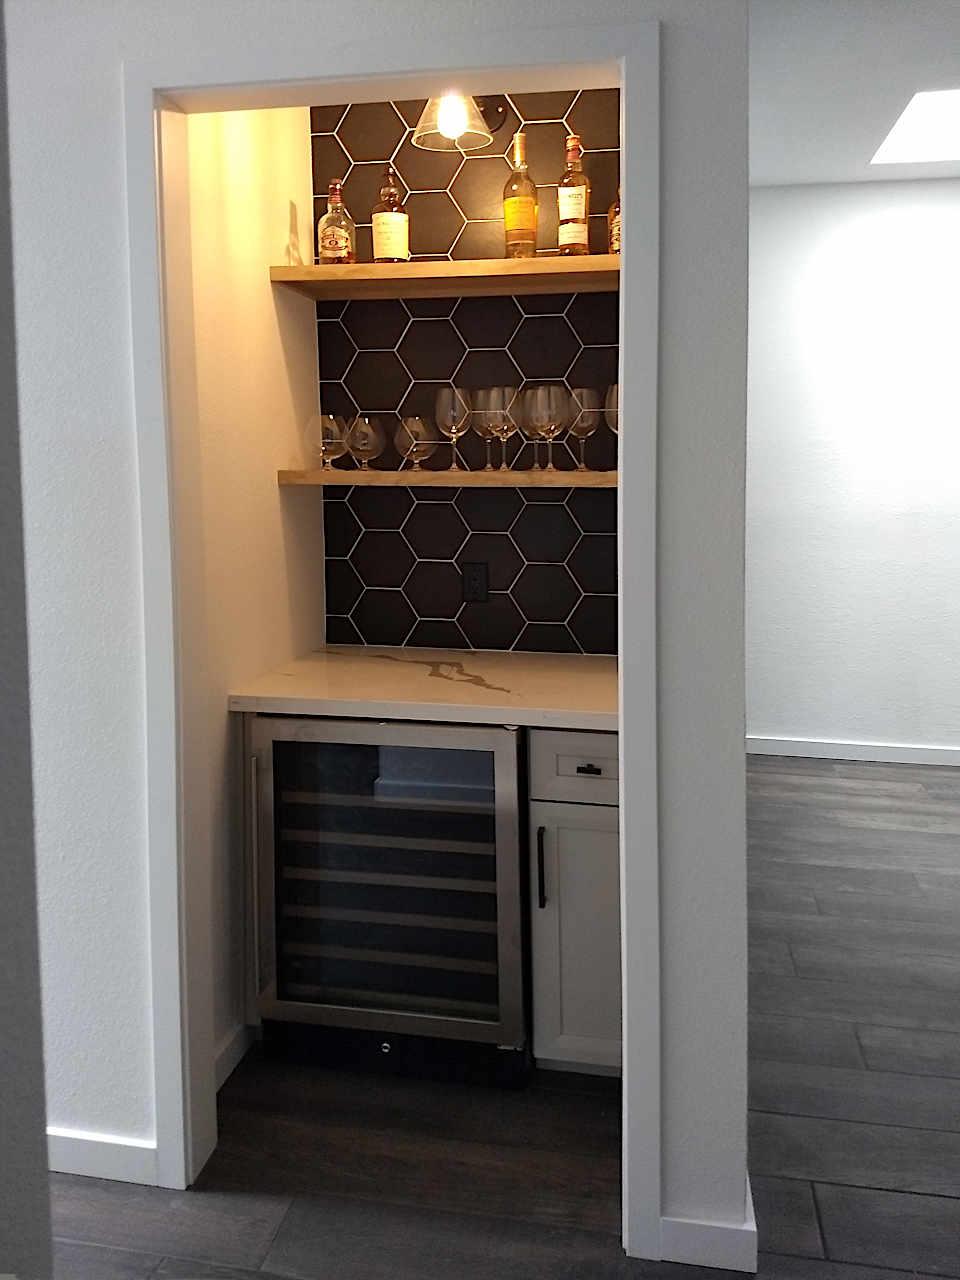 built-in-bar-in-closet